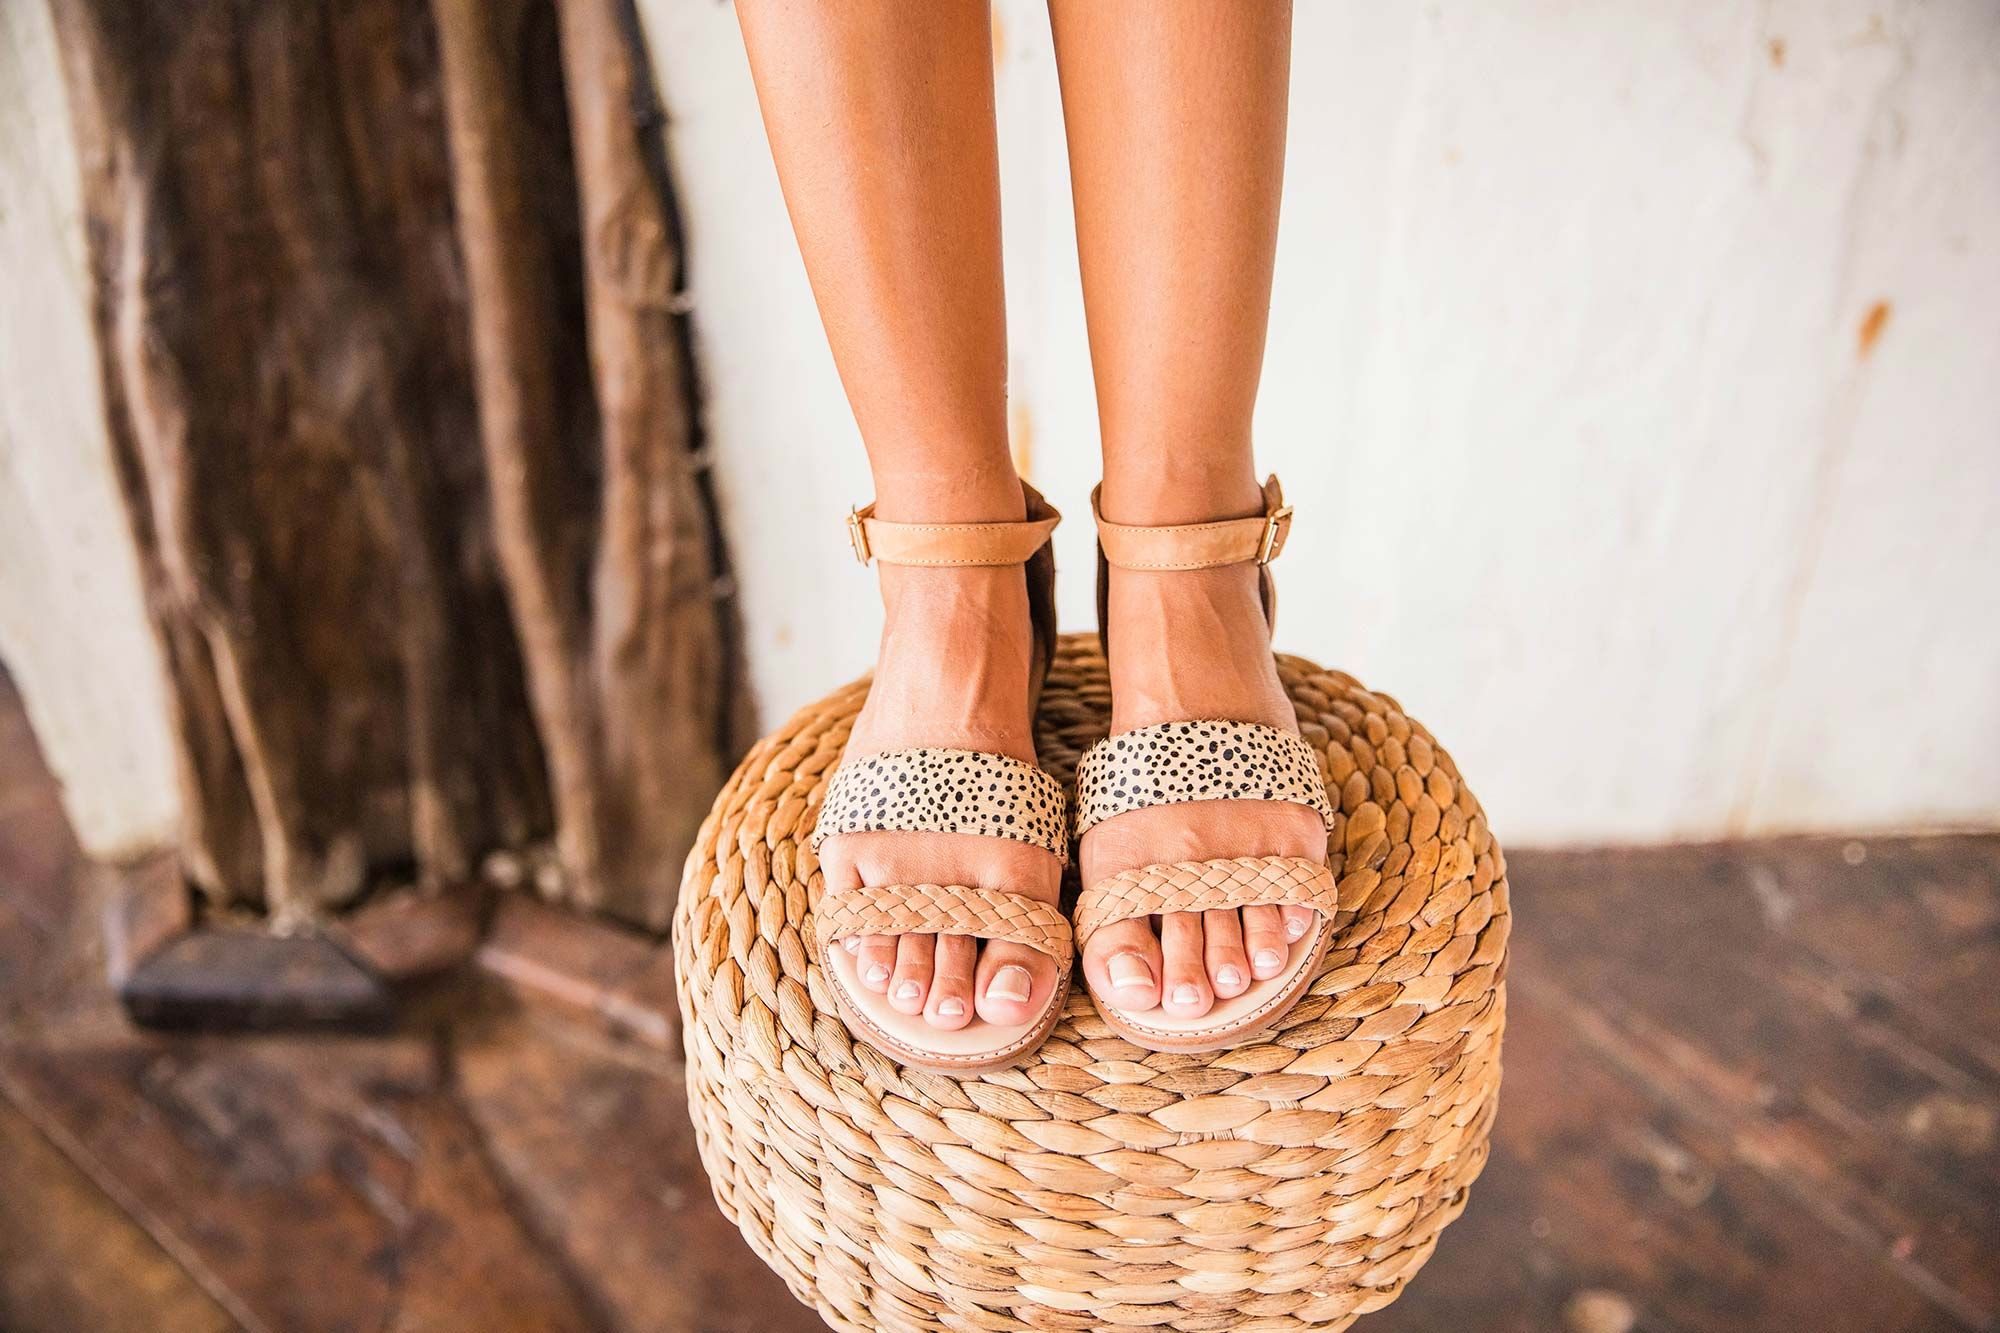 Bared_Footwear_La_Brisa_Bali_Travel_Summer_Womens_Campaign_Partridge_Tan_Spot_Sandals_Close_Up